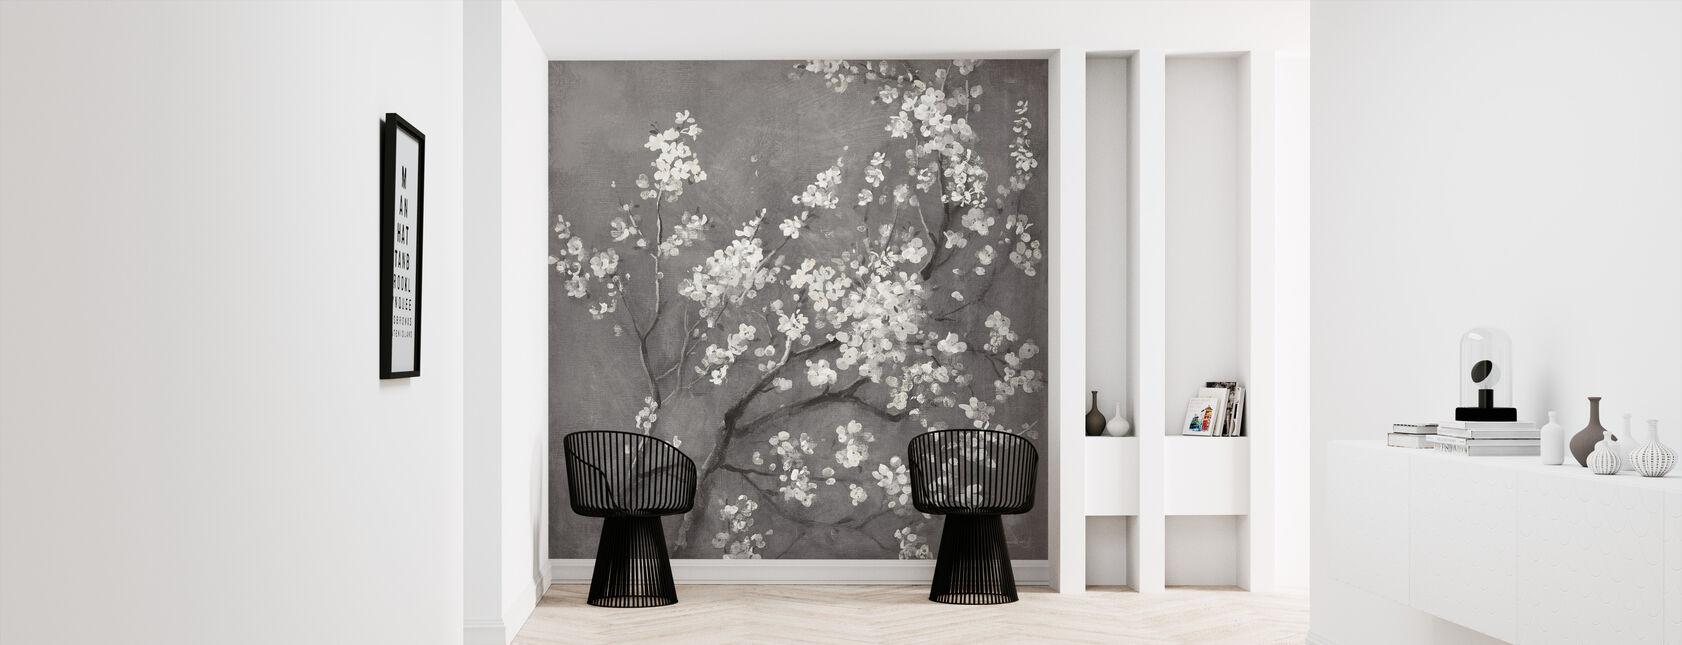 White Cherry Blossoms I on Grey Crop - Wallpaper - Hallway